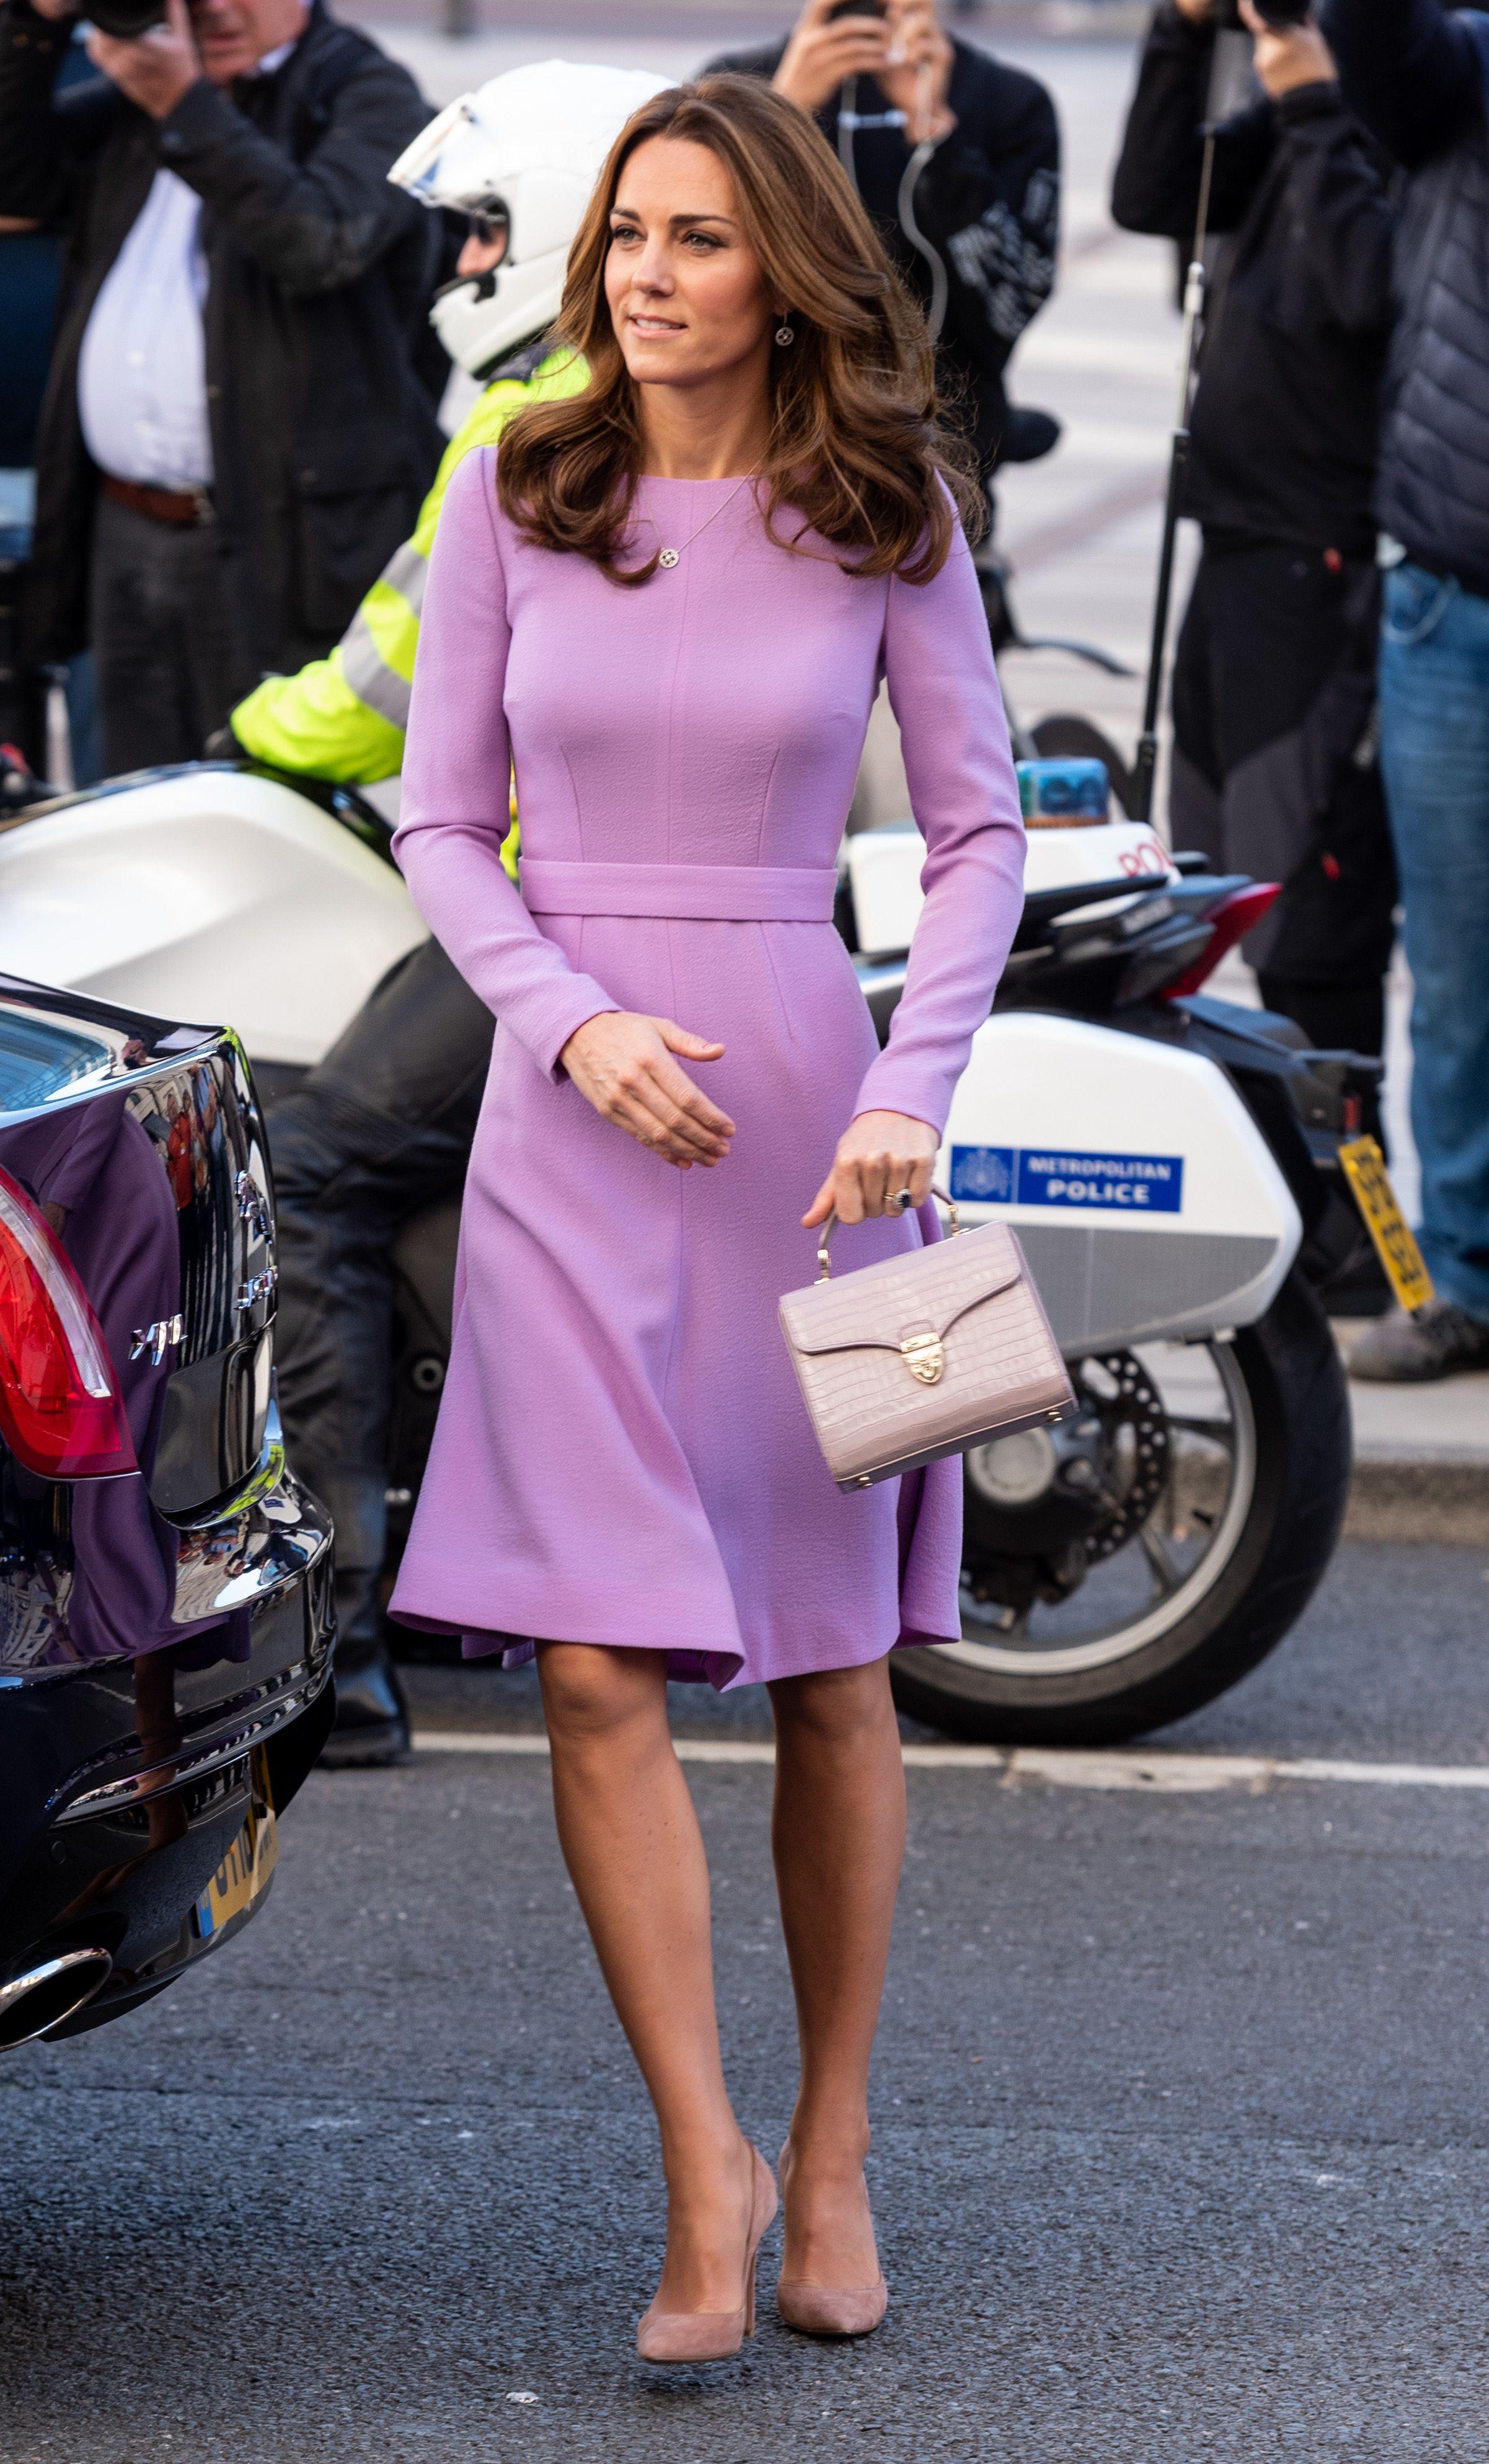 The Duchess of Cambridge wore a chic Erdem dress to the Victoria & Albert Museum